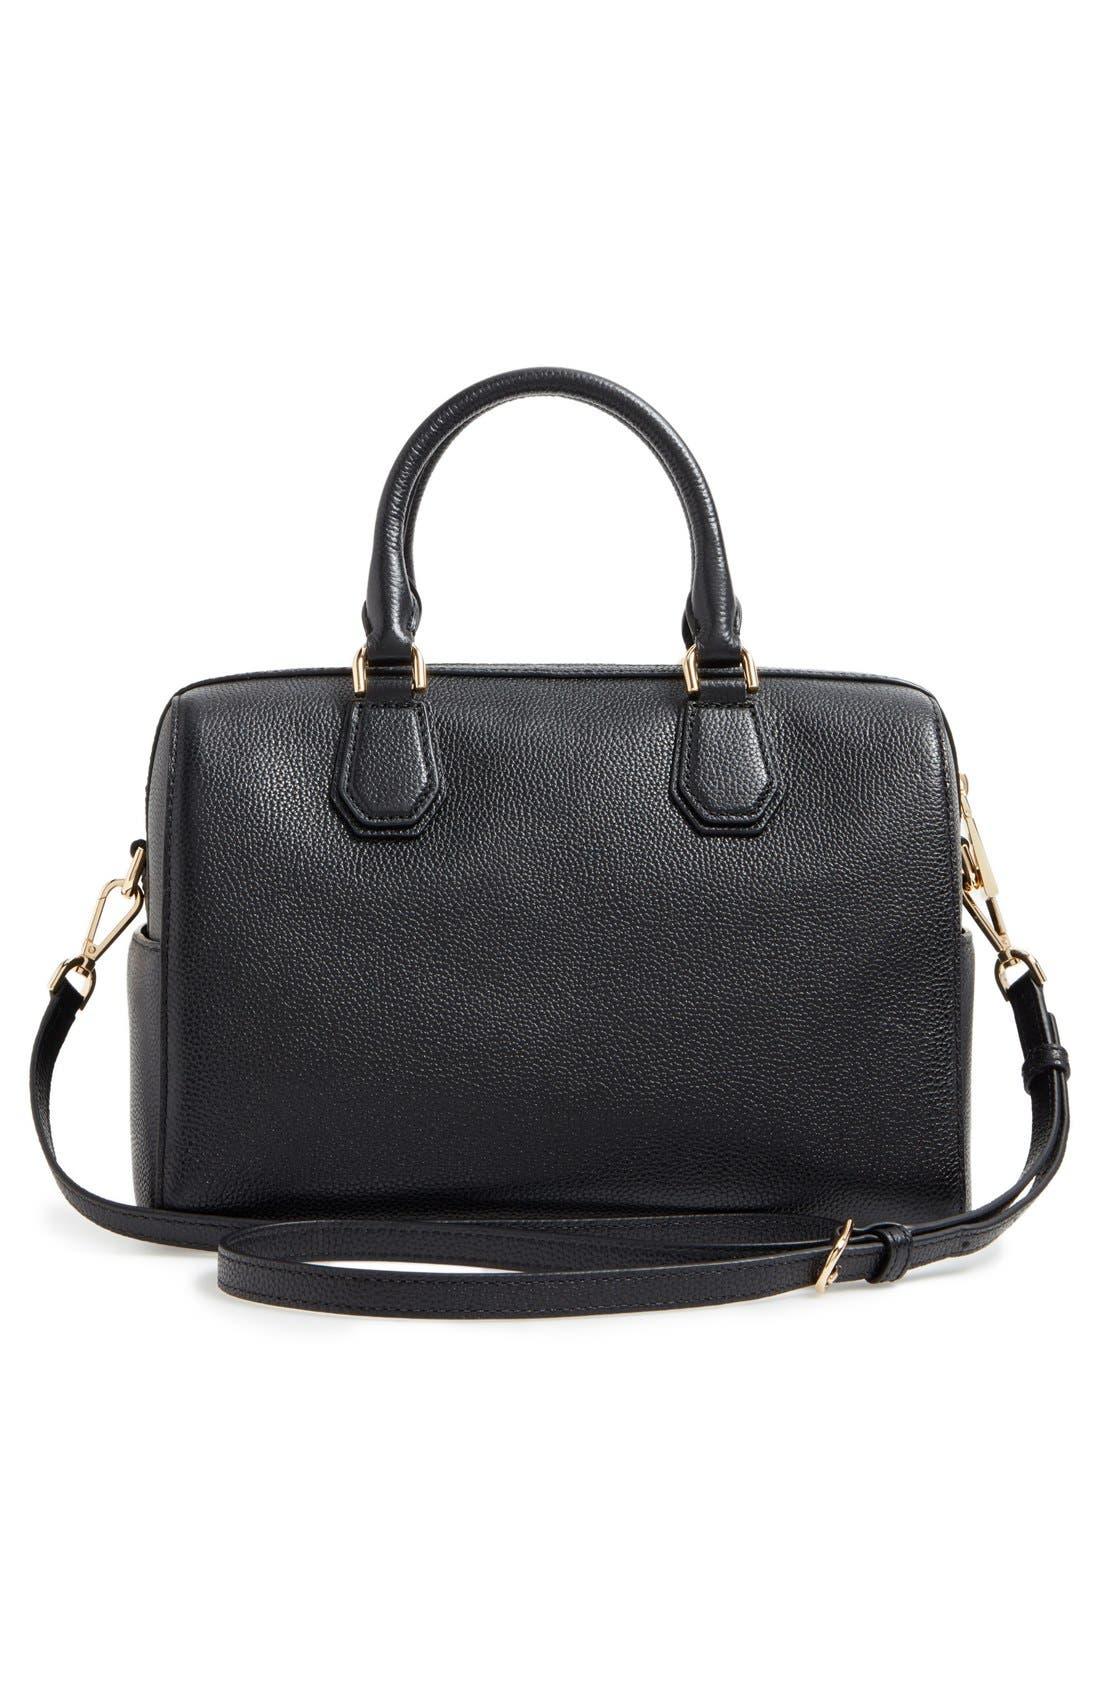 Medium Mercer Duffel Bag,                             Alternate thumbnail 3, color,                             Black/ Gold